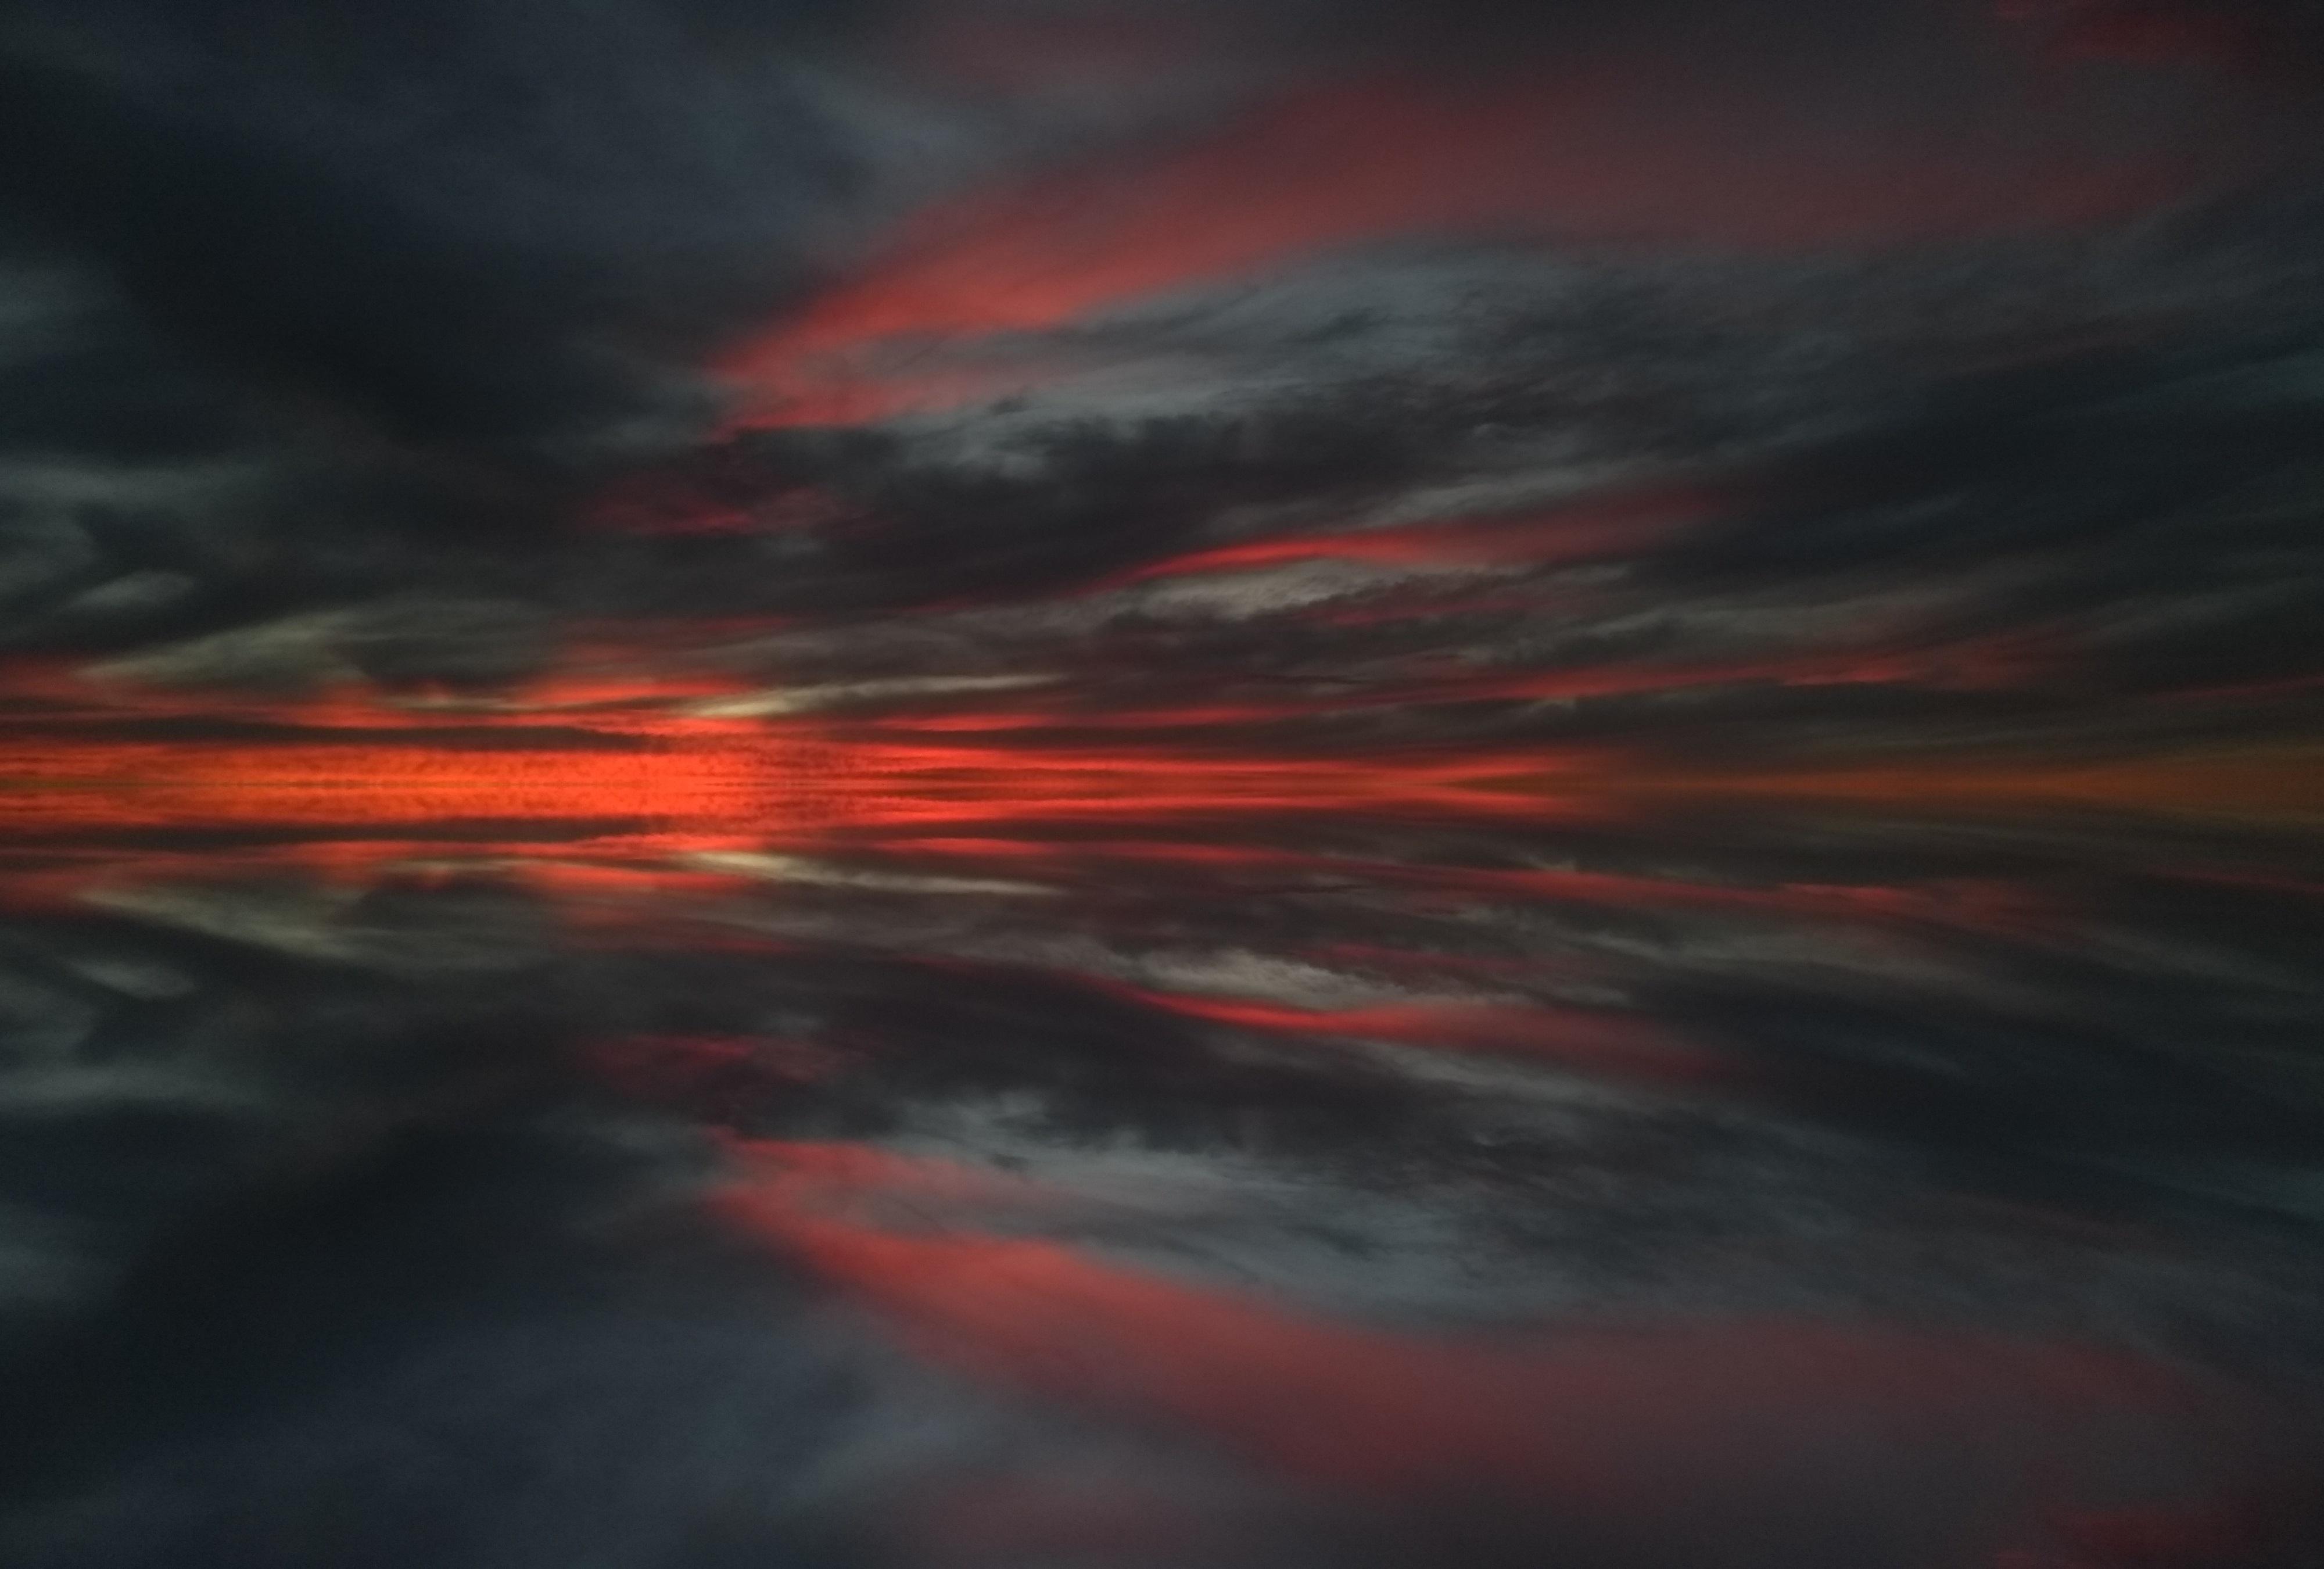 supernova remnant afterglow